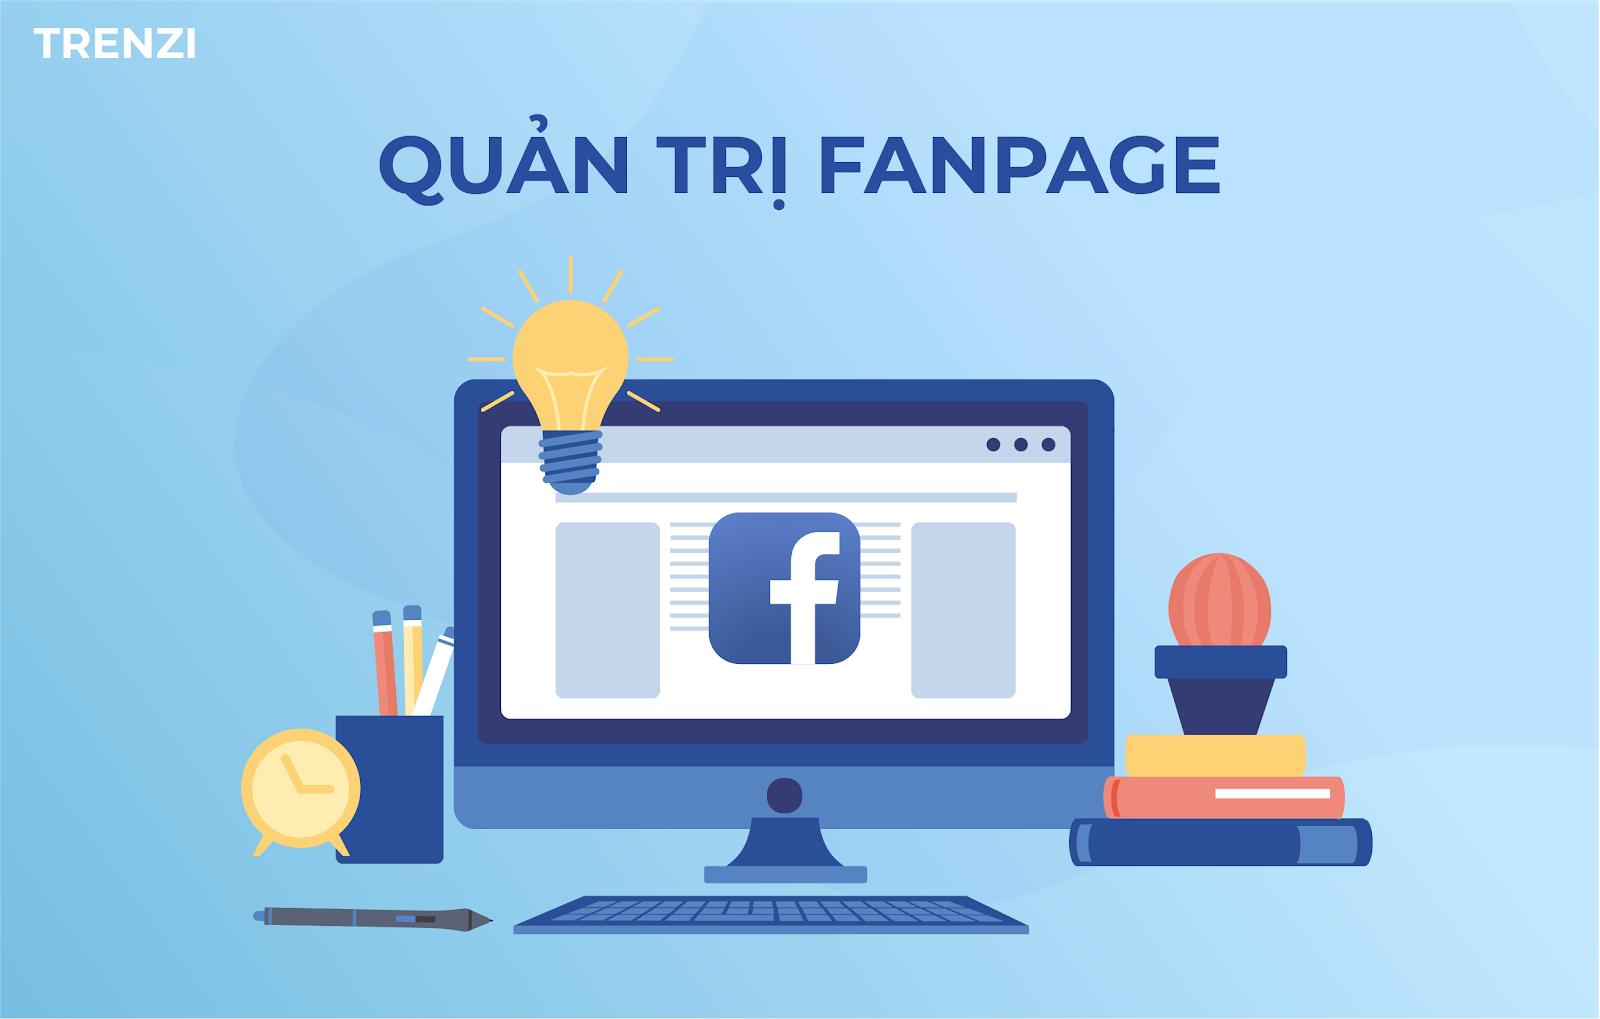 quan-tri-fanpage-giup-doanh-nghiep-thanh-cong-voi-marketing-facebook